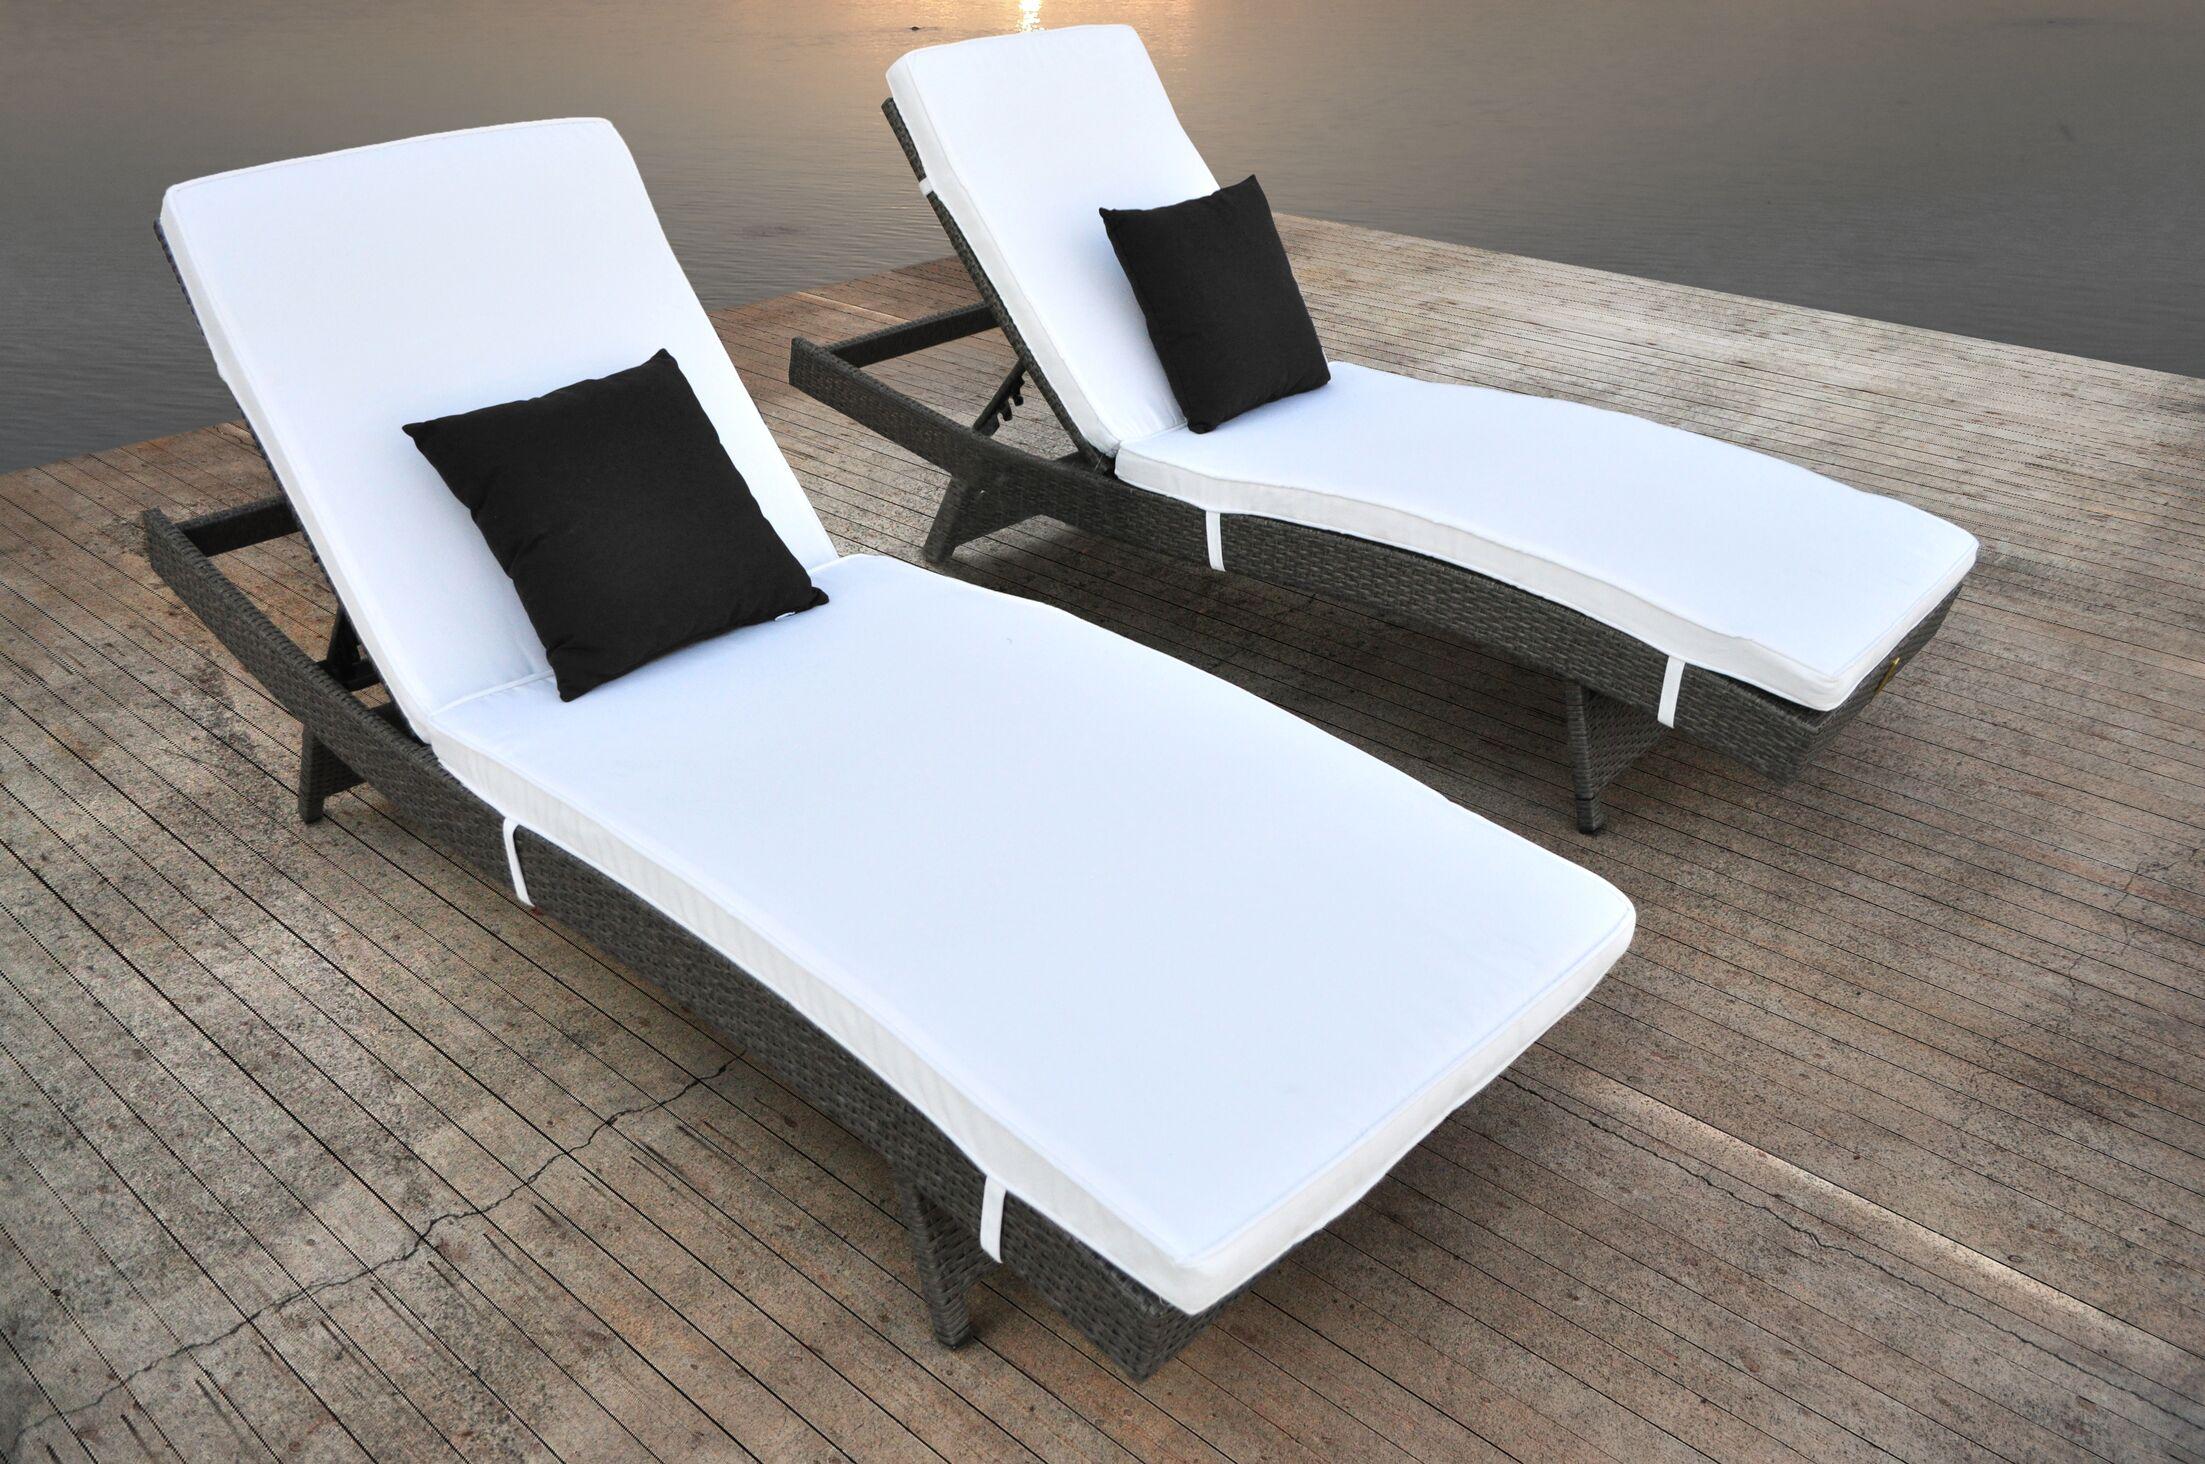 Zori Chaise Lounge with Cushion Finish: Cement Gunmetal Gray